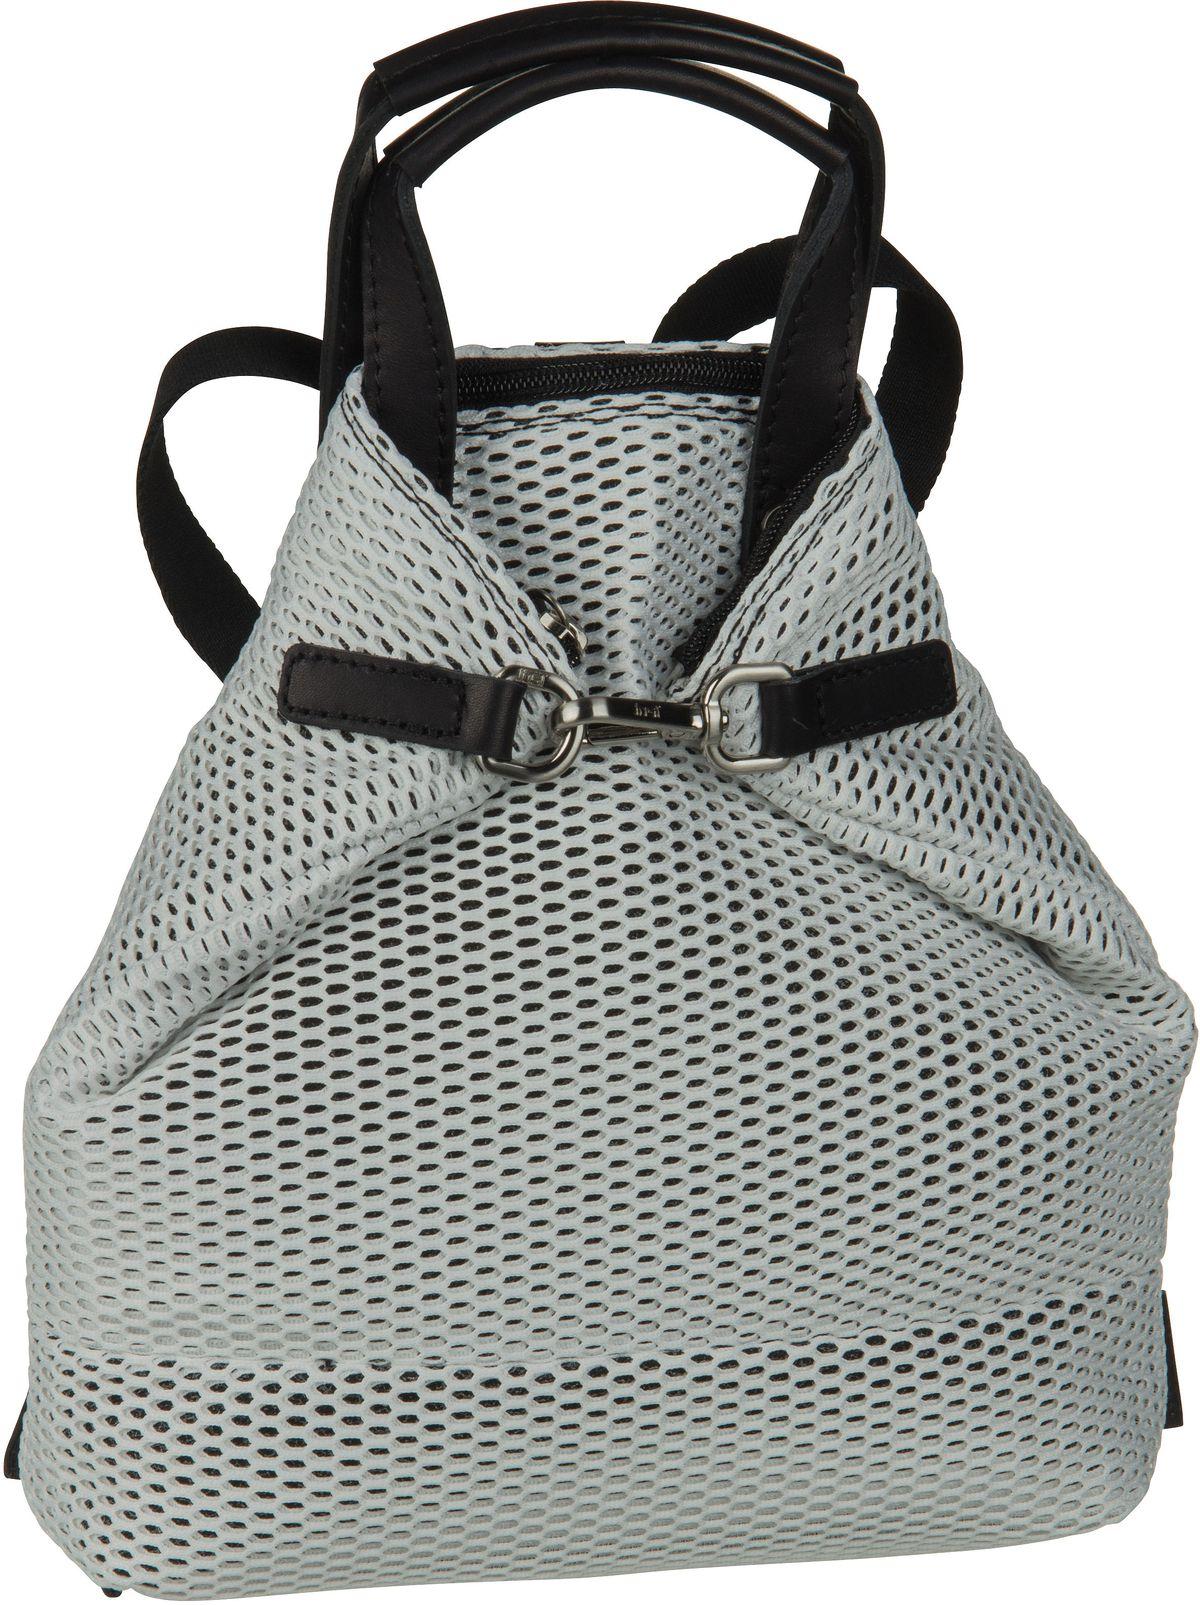 Rucksack / Daypack Mesh 6176 X-Change Bag Mini White